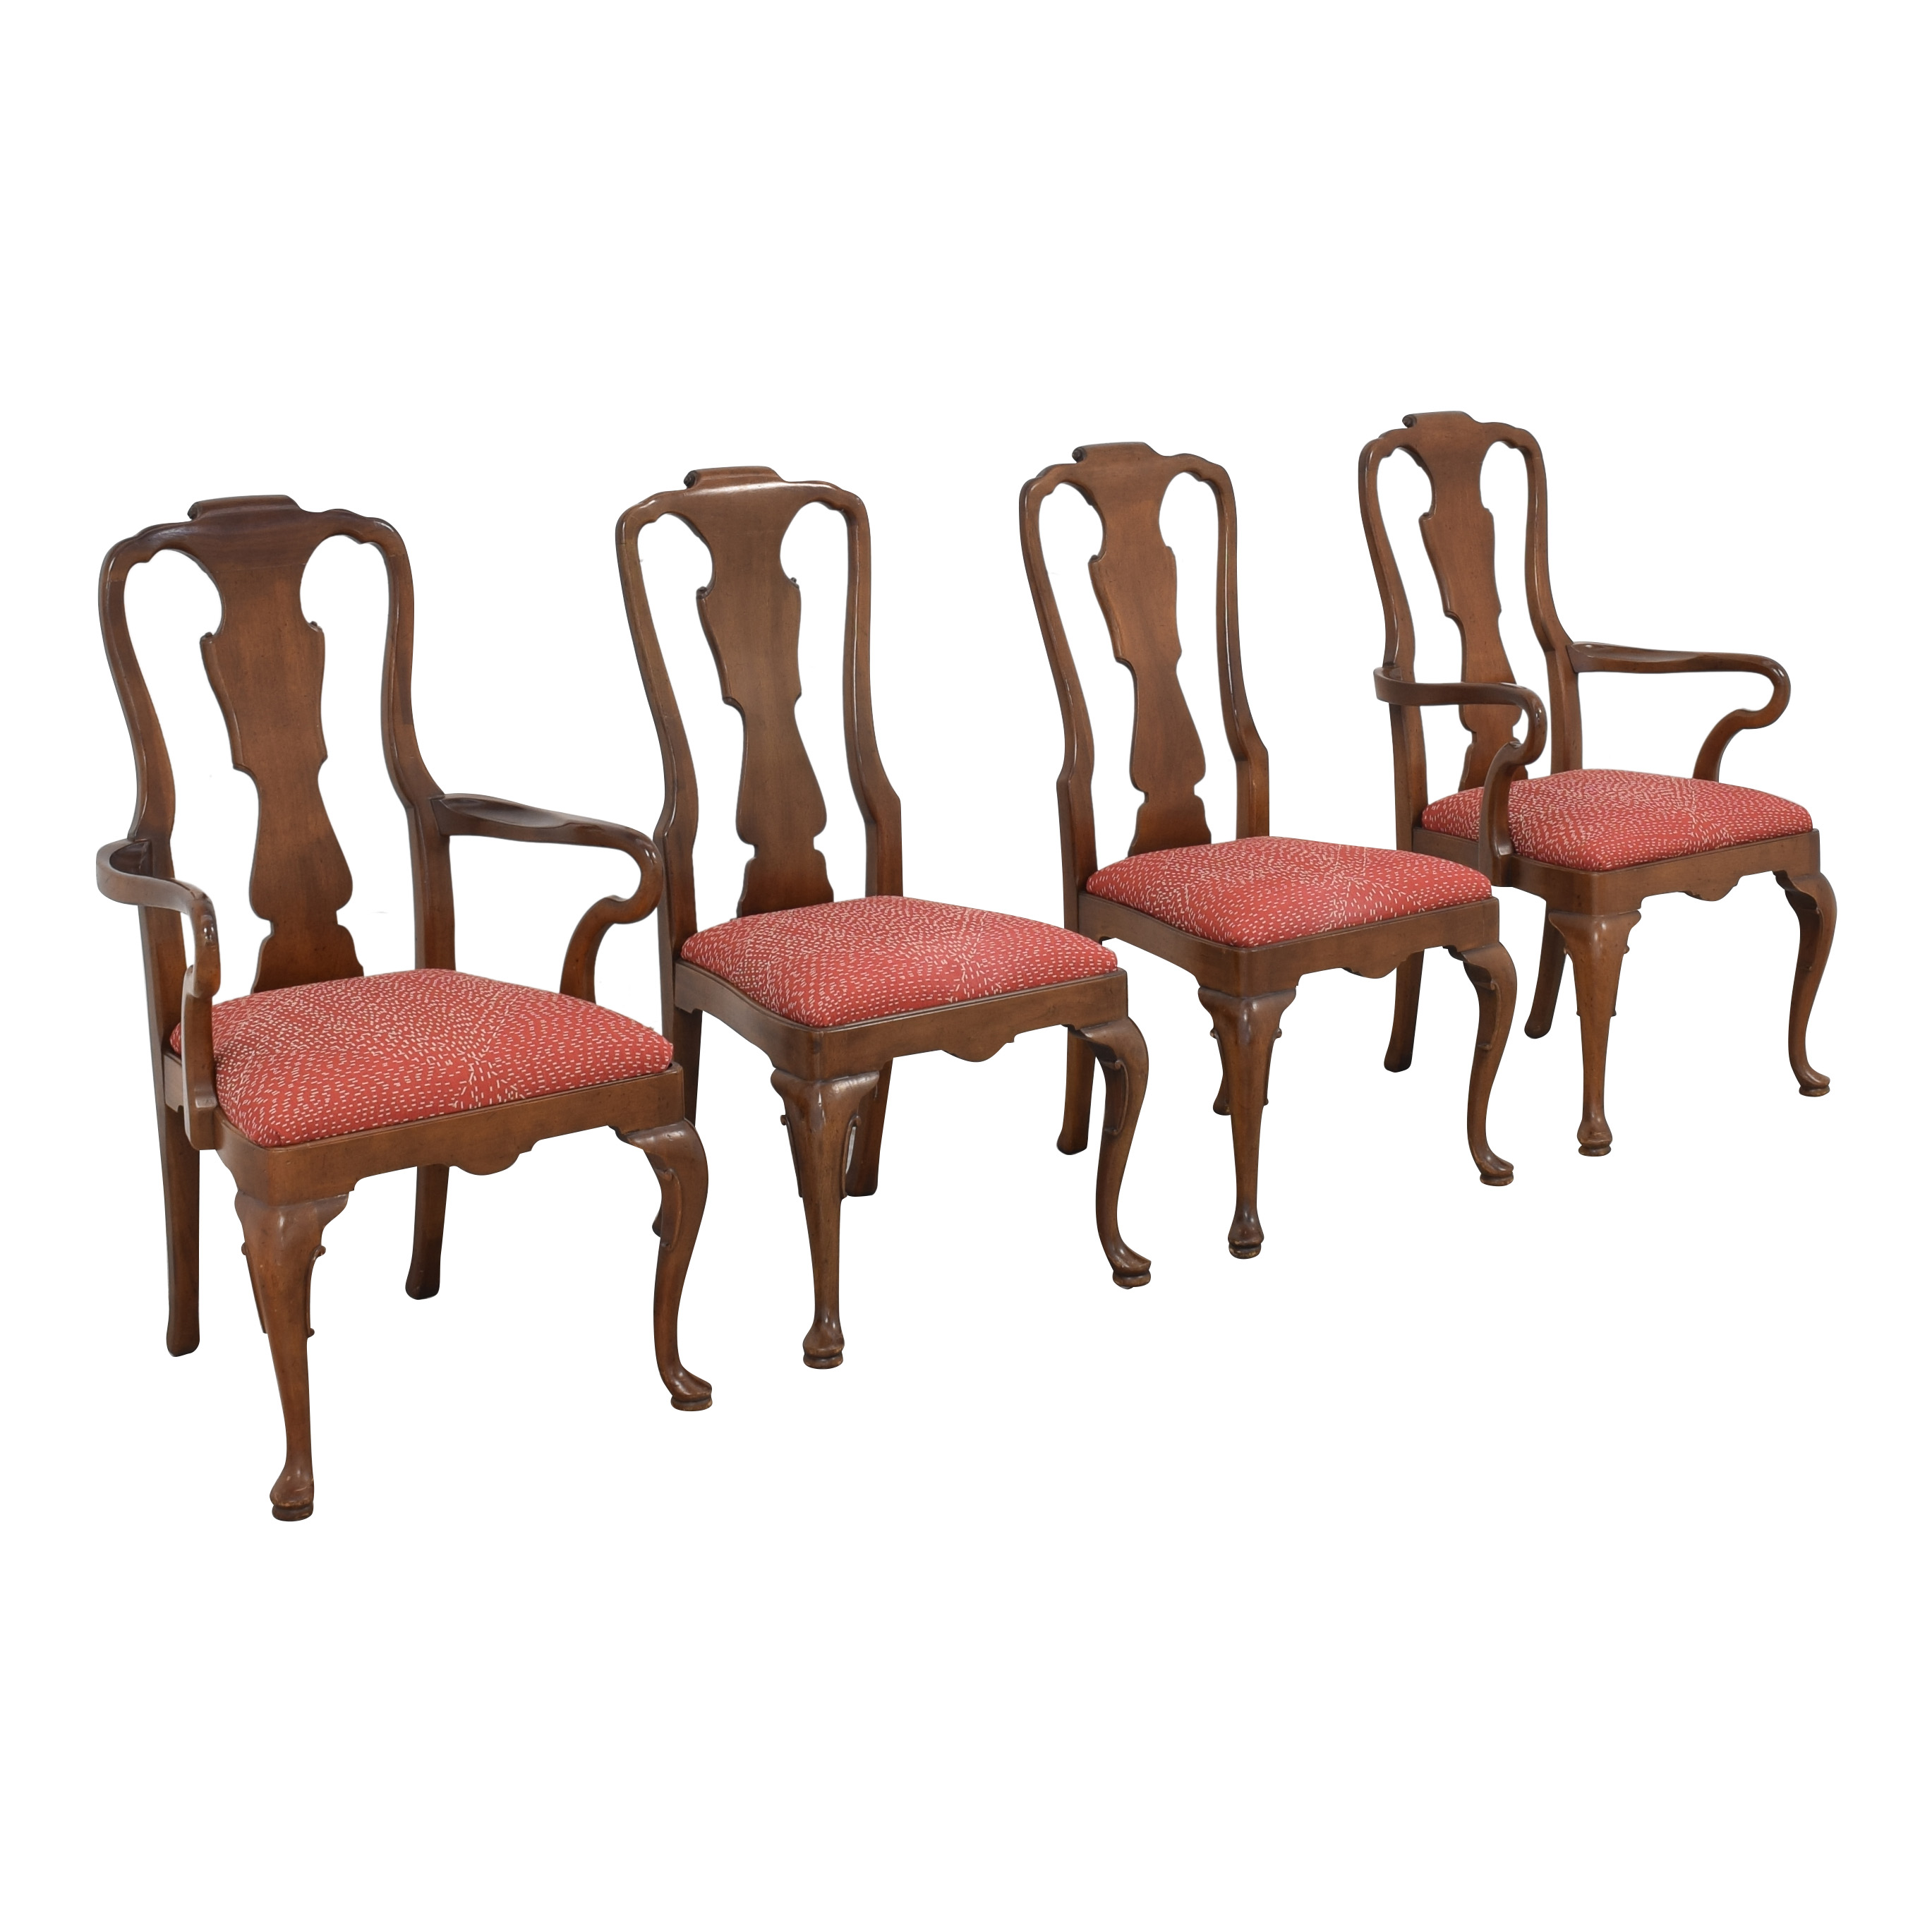 Henredon Furniture Henredon Queen Anne Chairs dimensions